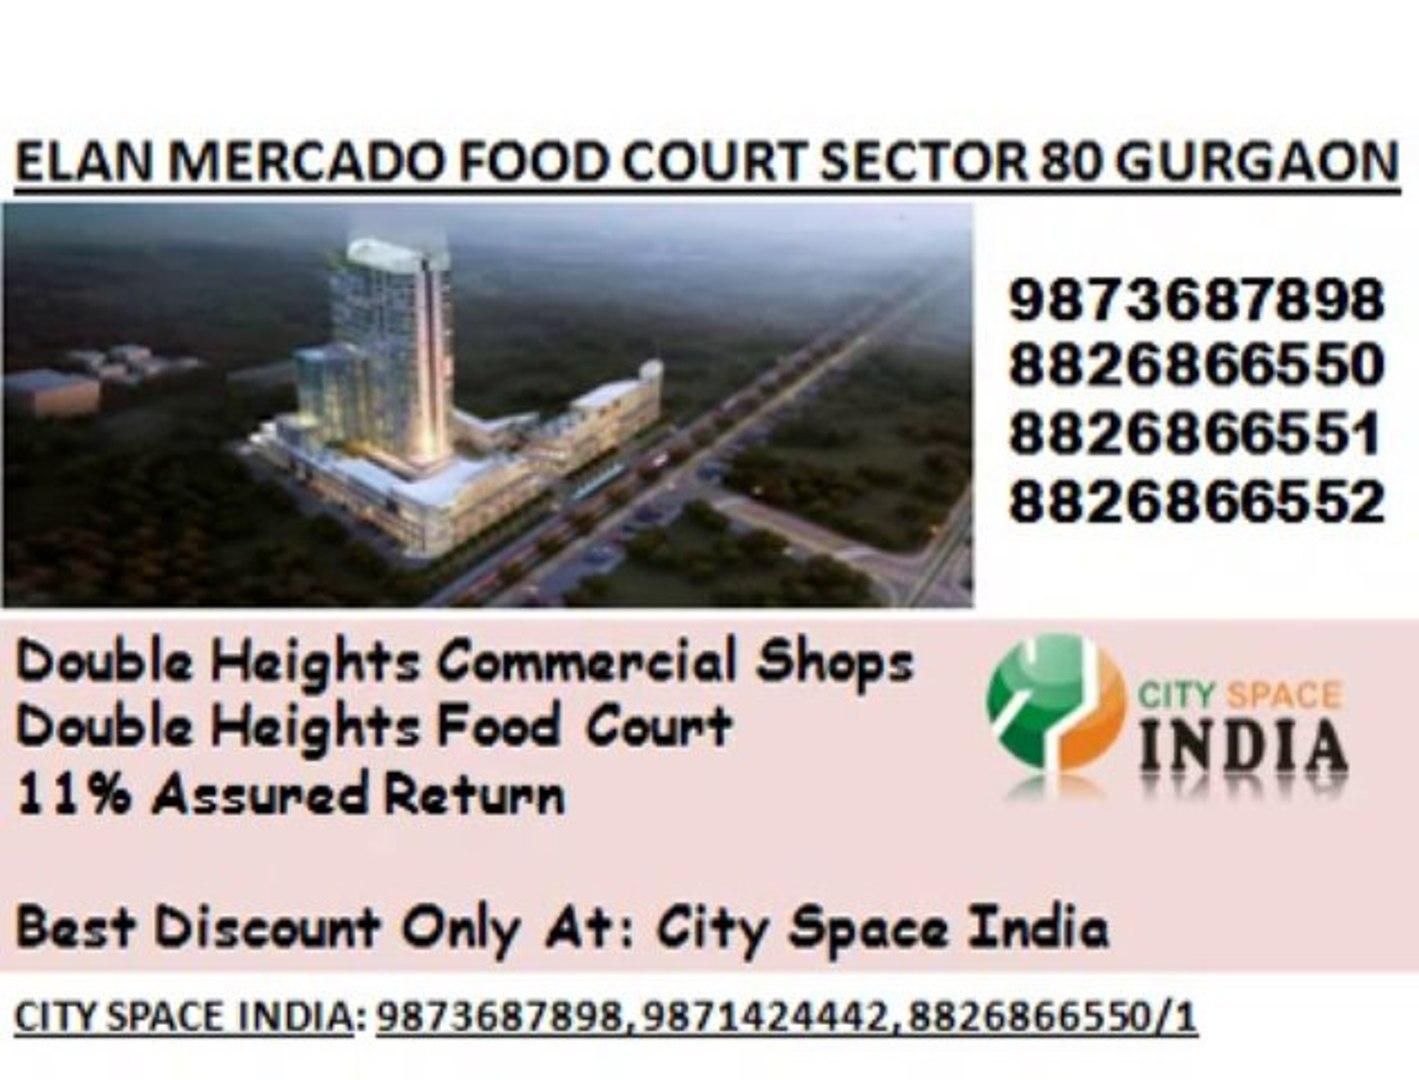 DIRECT BOOKING@  8447070834  ELAN FOOD COURT  GET SMALL SHOP